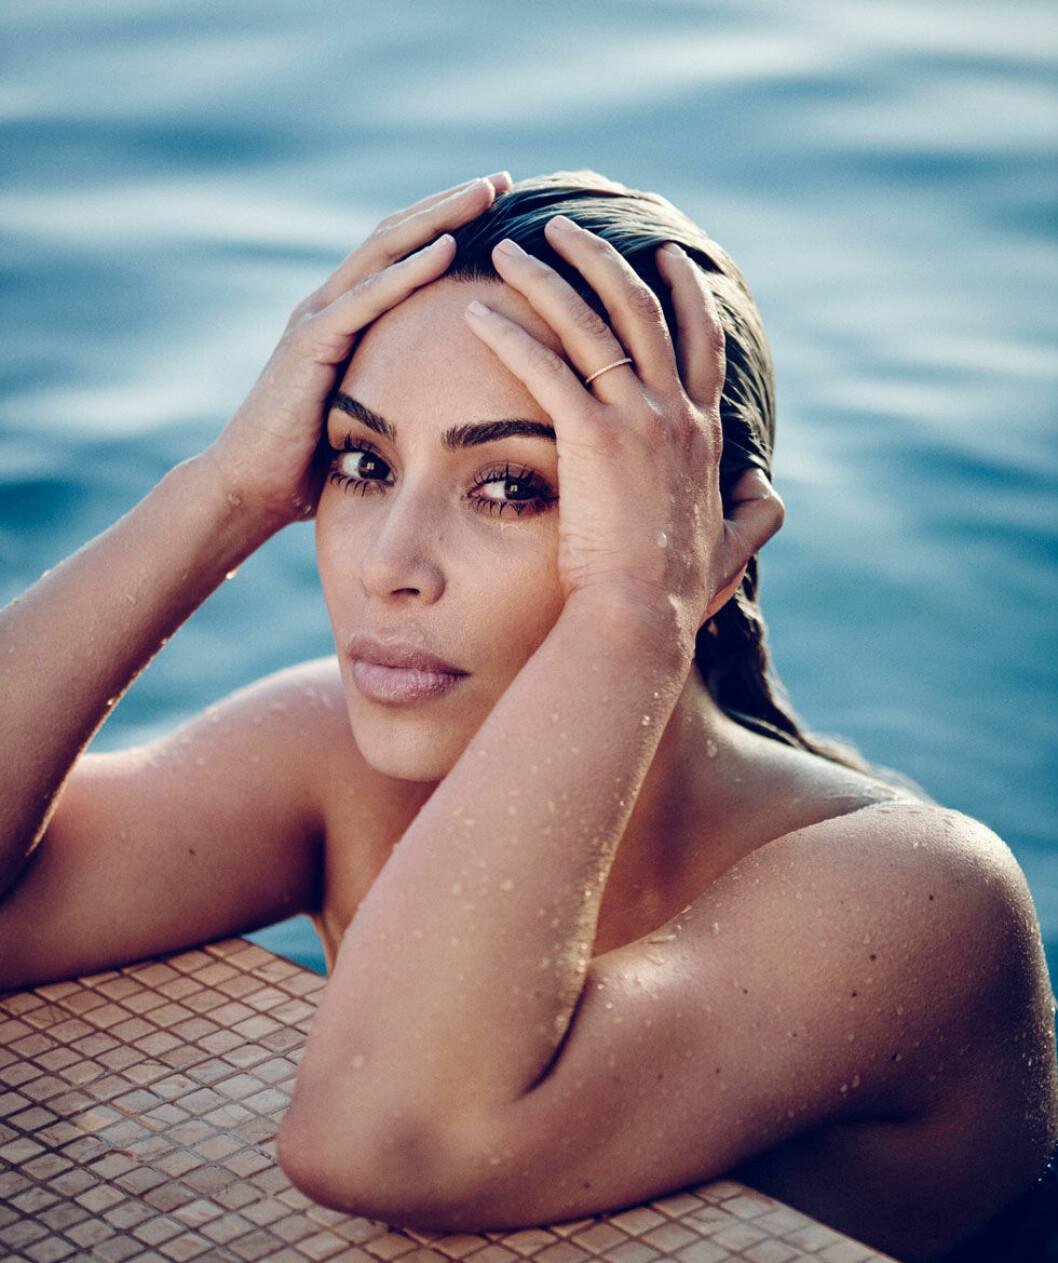 ELLE har träffat Kim Kardashian i hennes hem.